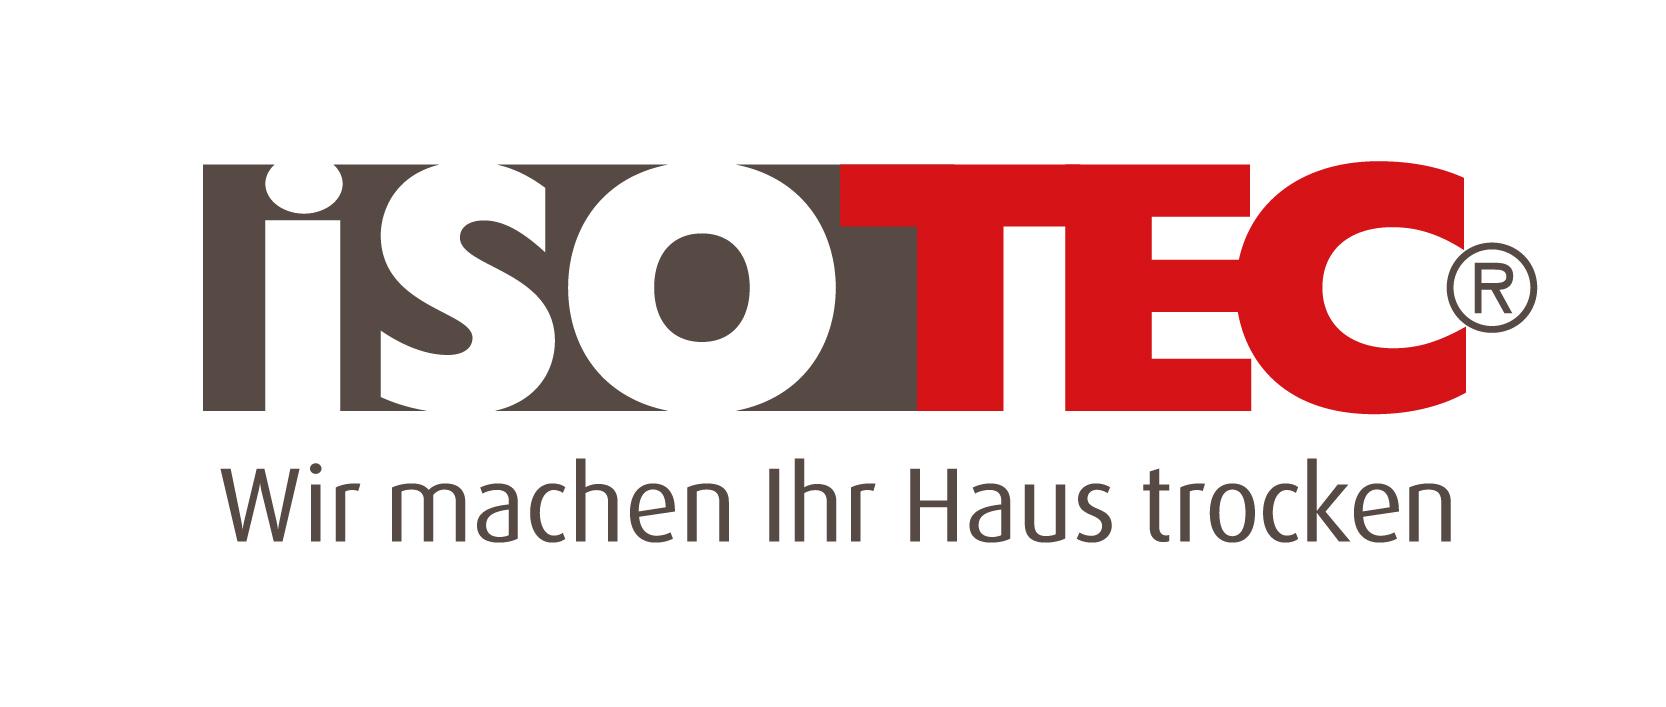 ISOTEC-Fachbetrieb Abdichtungssysteme Norbert Kroll